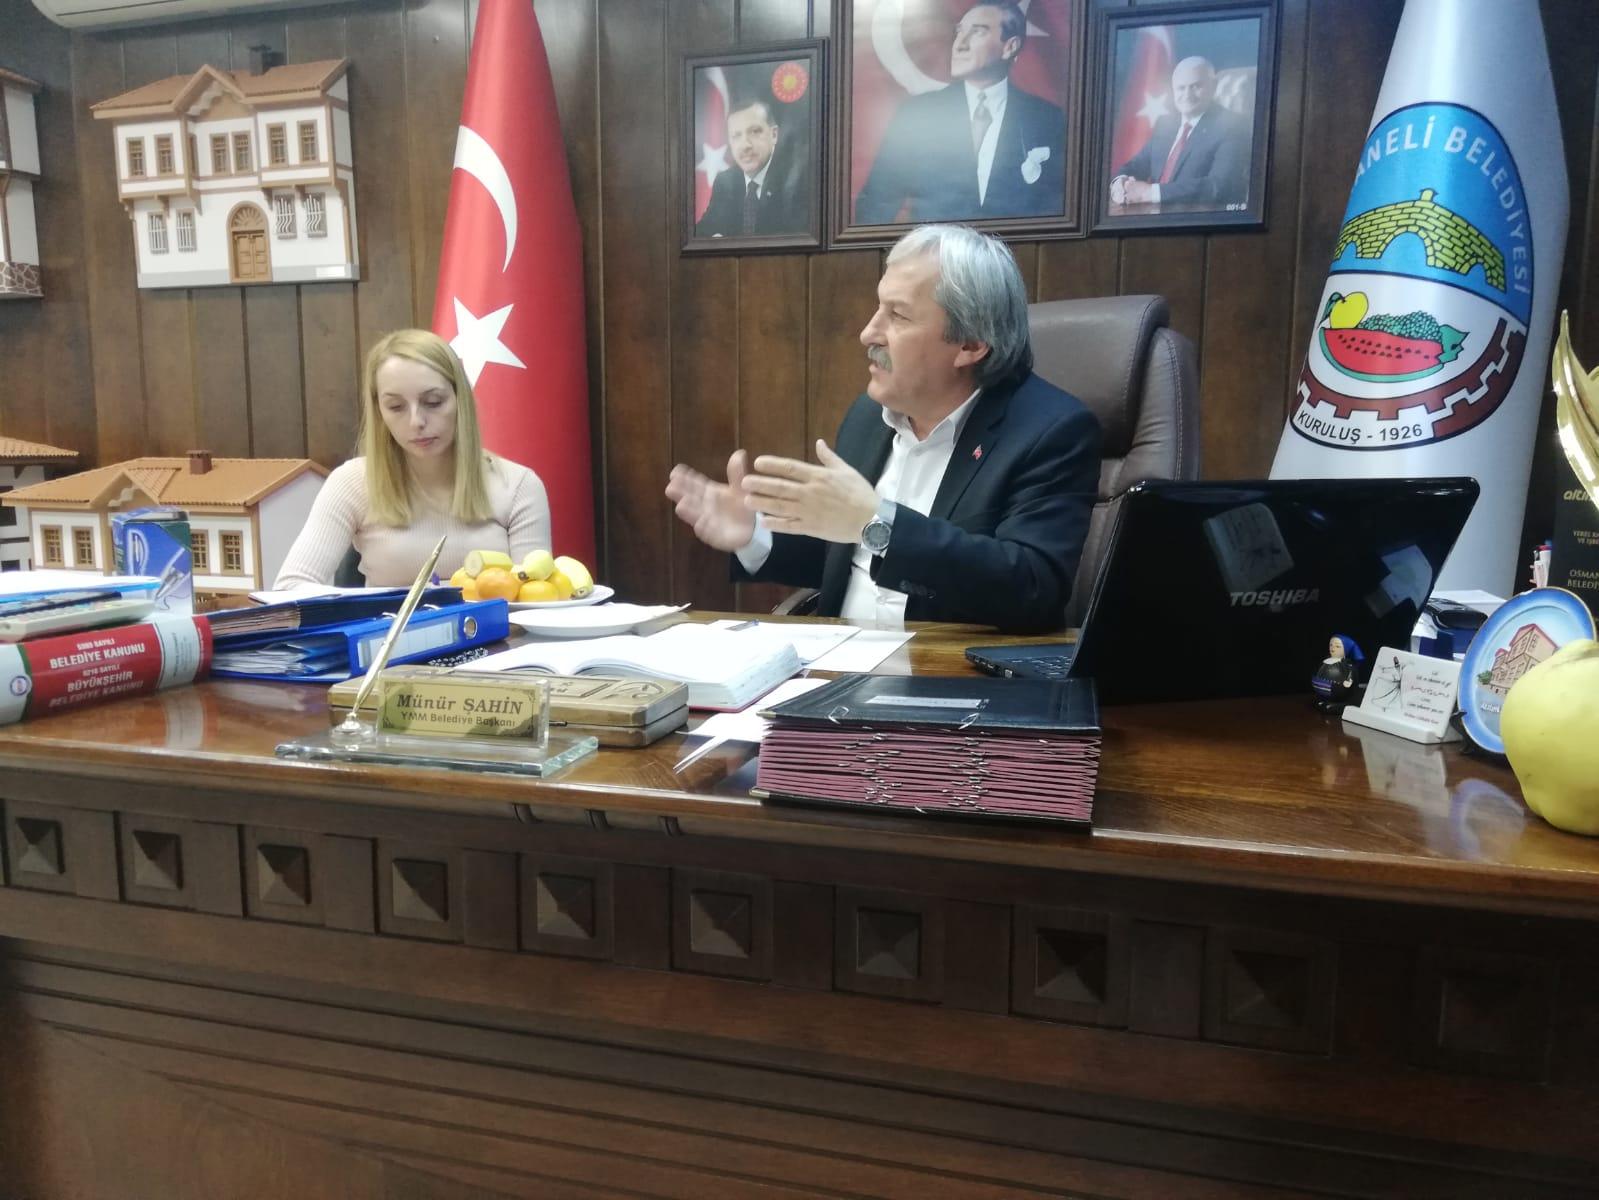 OSMANELİ BELEDİYE MECLİSİ TOPLANDI